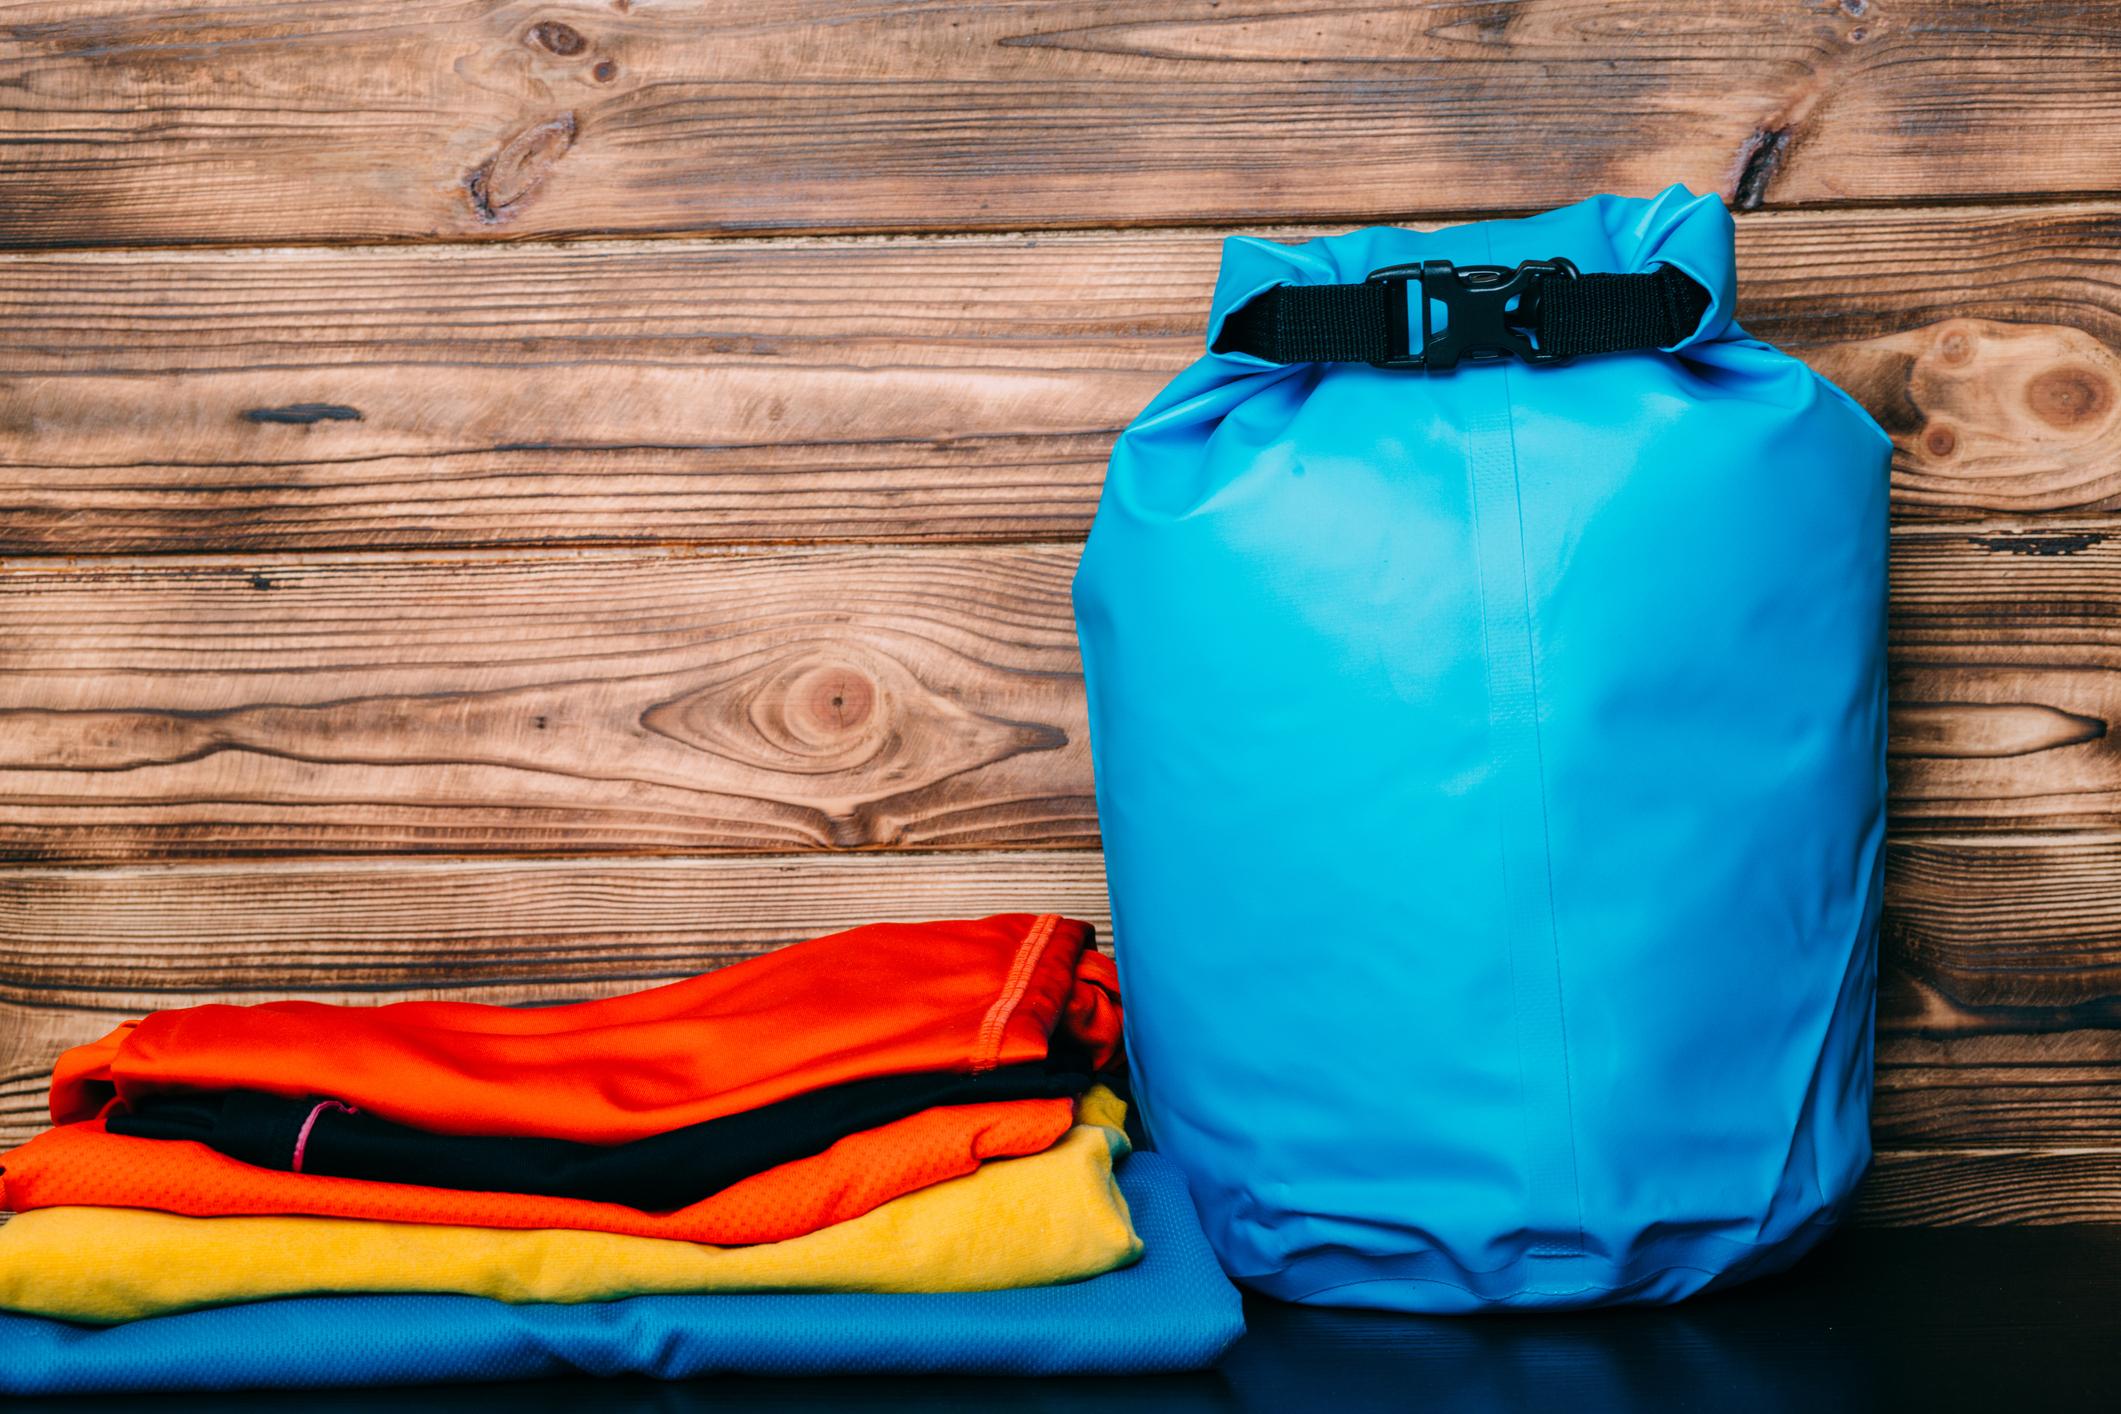 Outdoor Waterproof Bag For Tourism